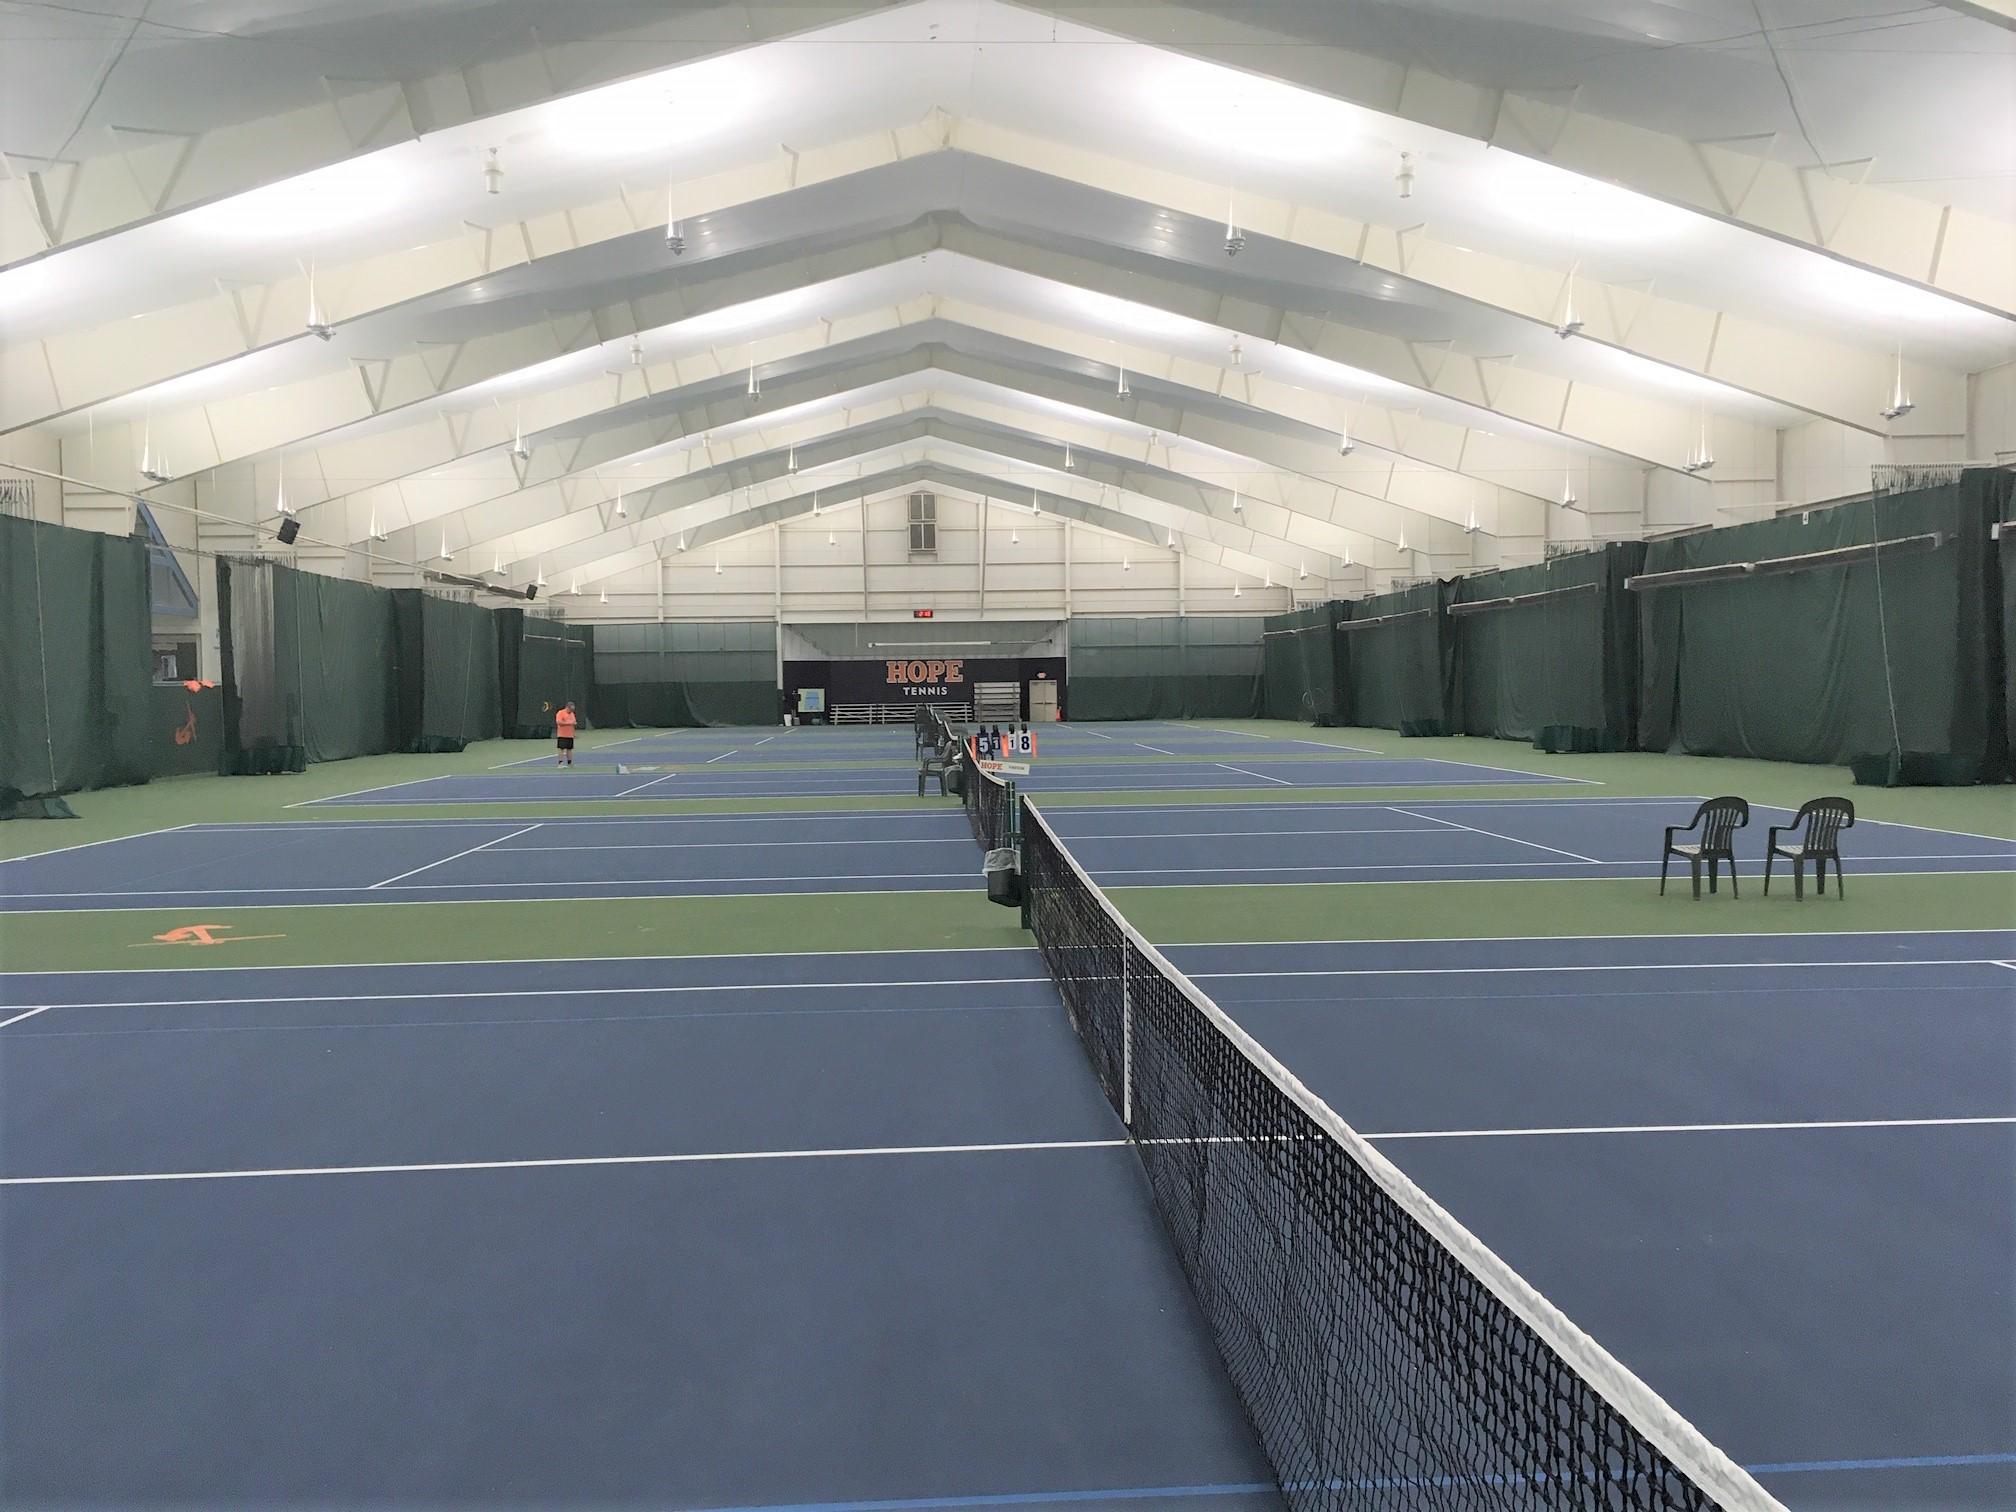 The DeWitt Tennis Center at Hope College